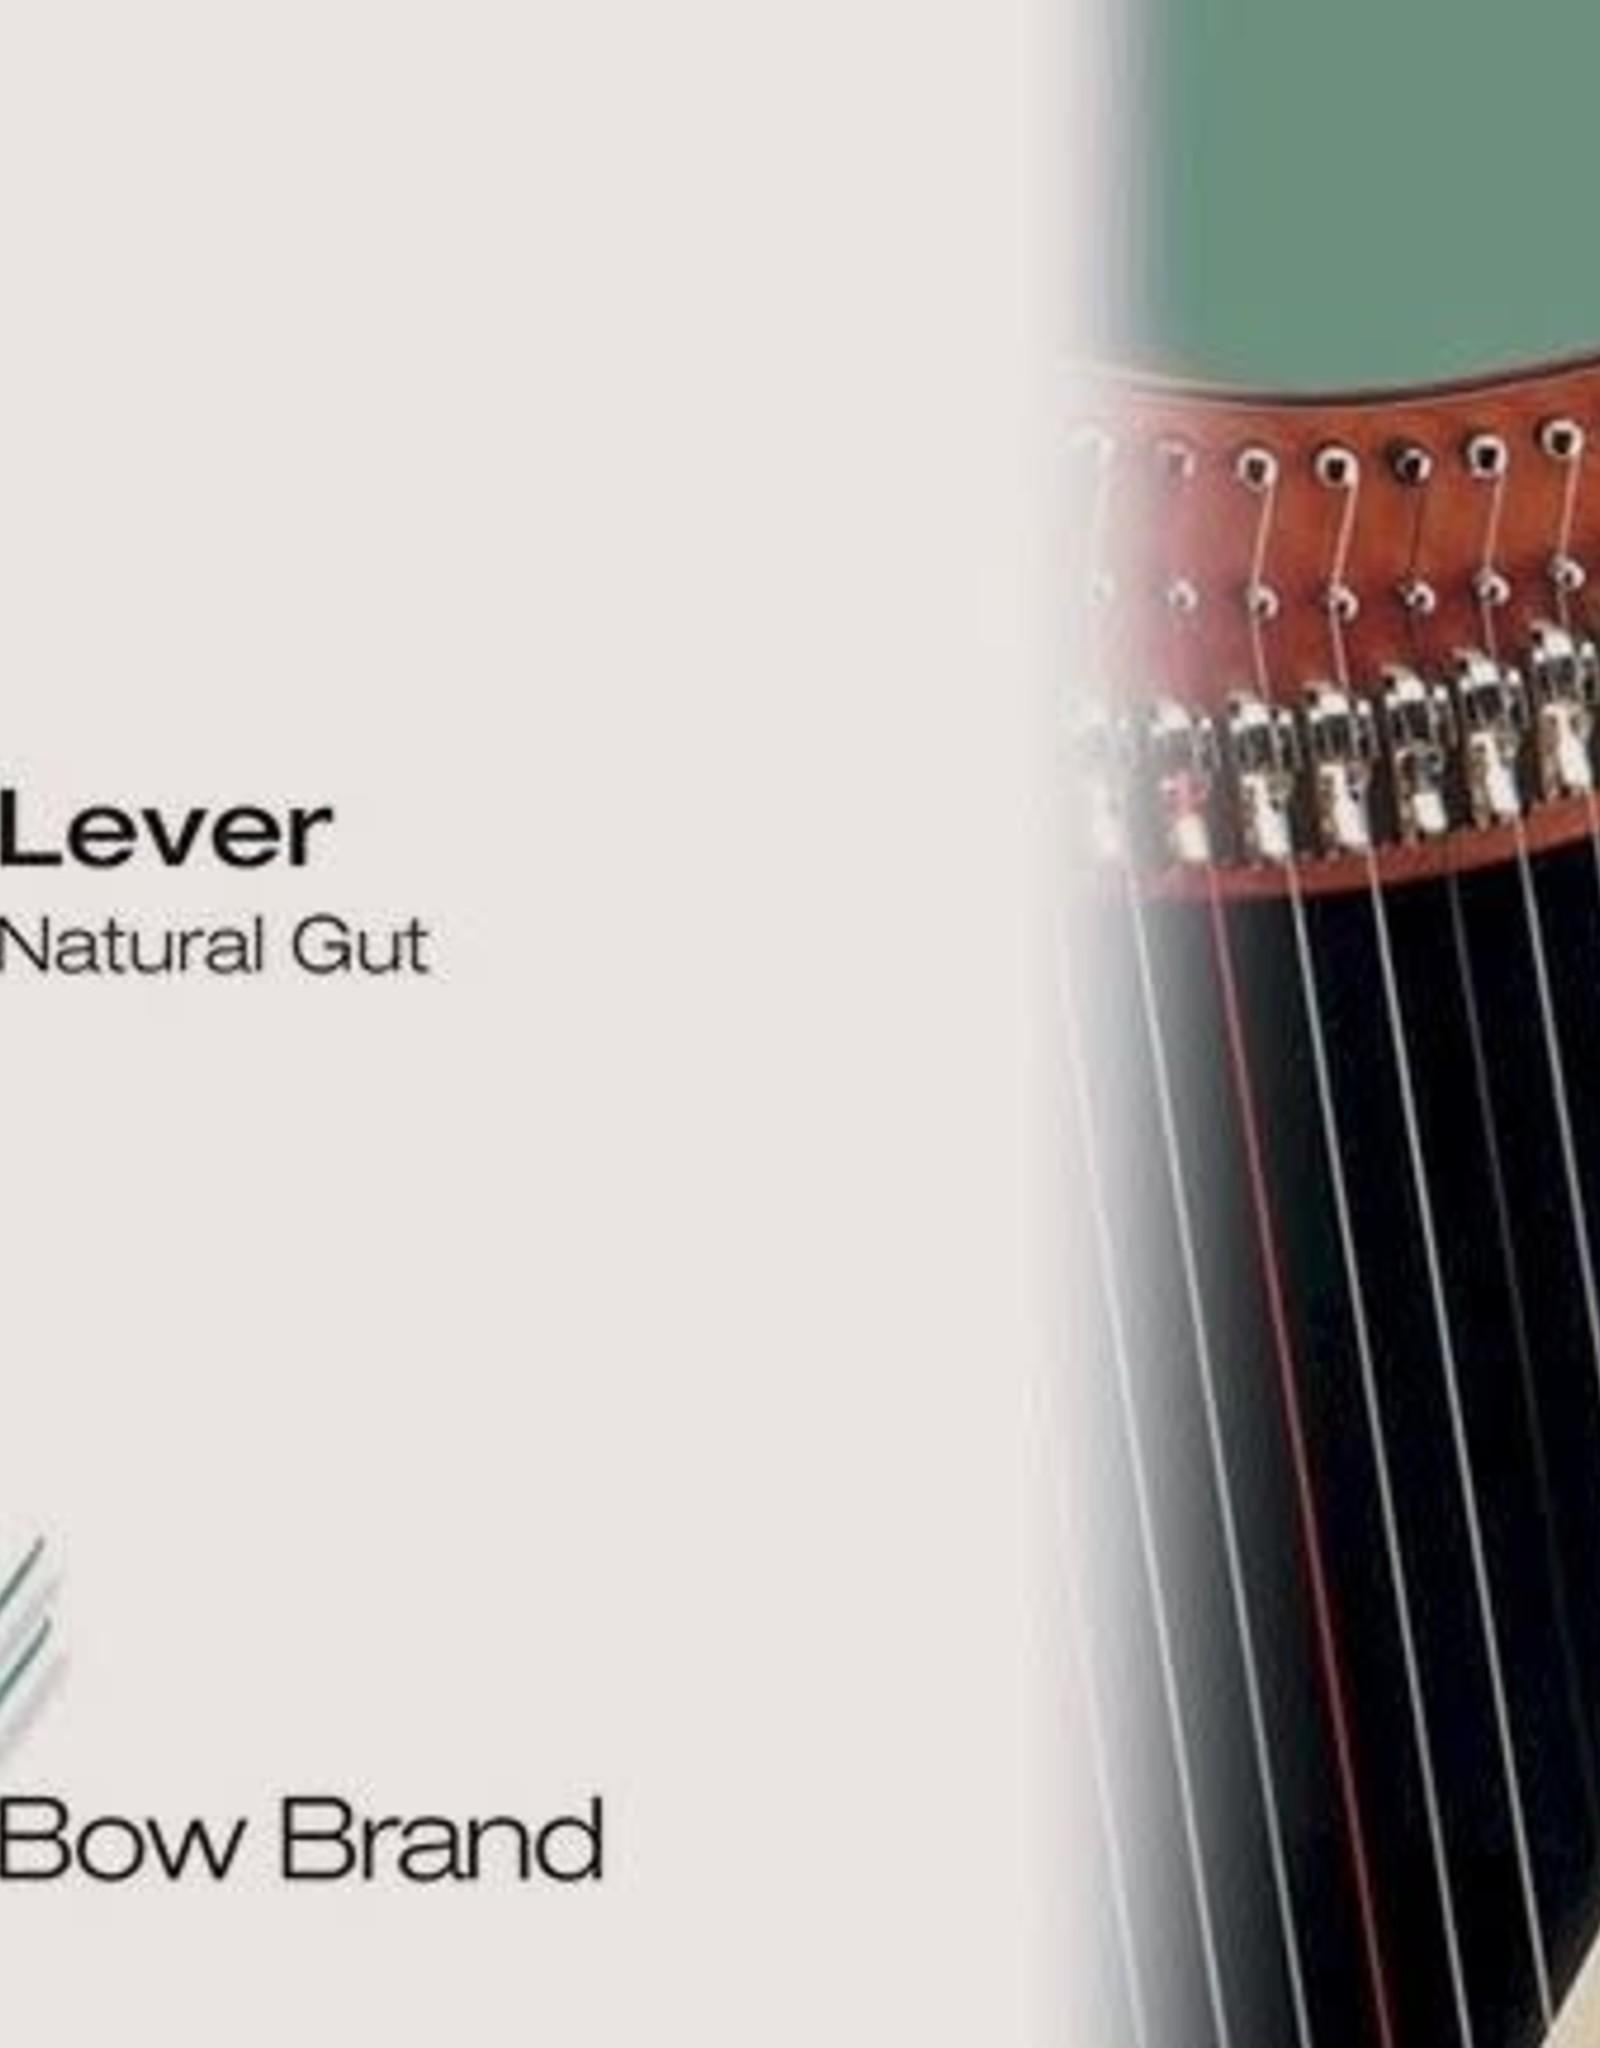 BOW BRAND  klep darm - lever GUT 15/3 mi